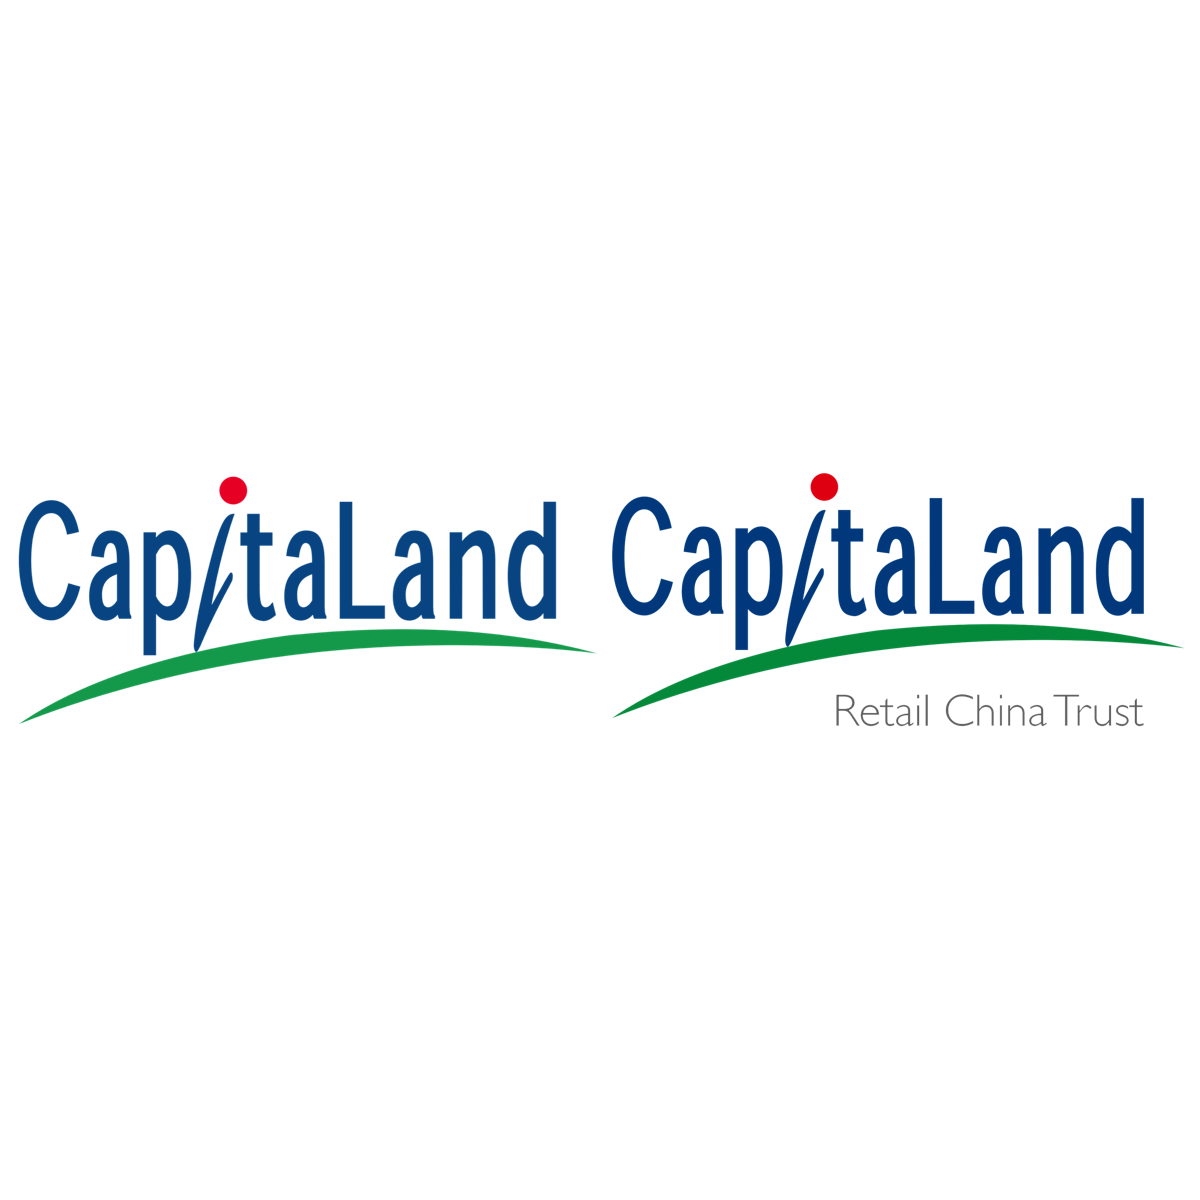 CapitaLand & CapitaLand Retail China Trust | SGinvestors.io